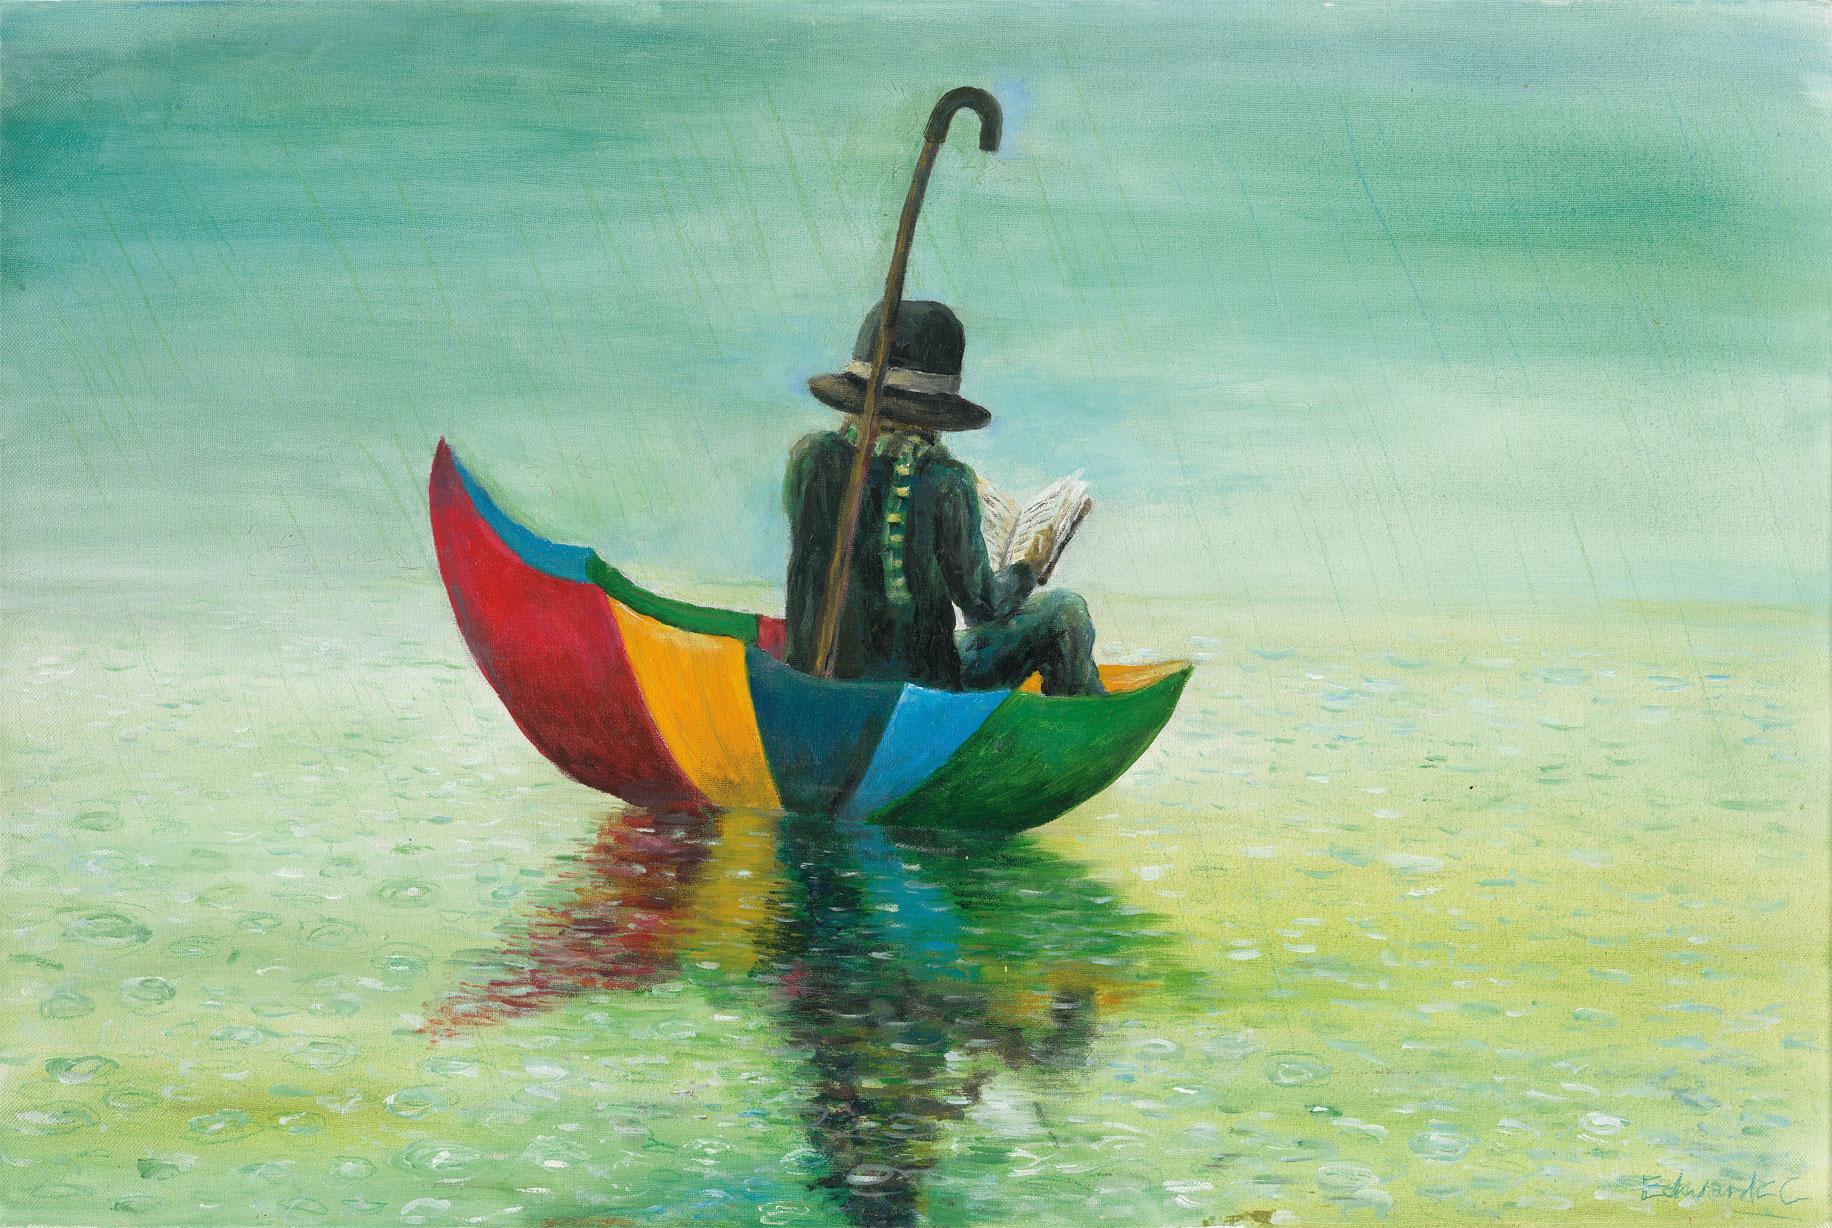 Umbrella Man - Acyrlic on Canvas 2005